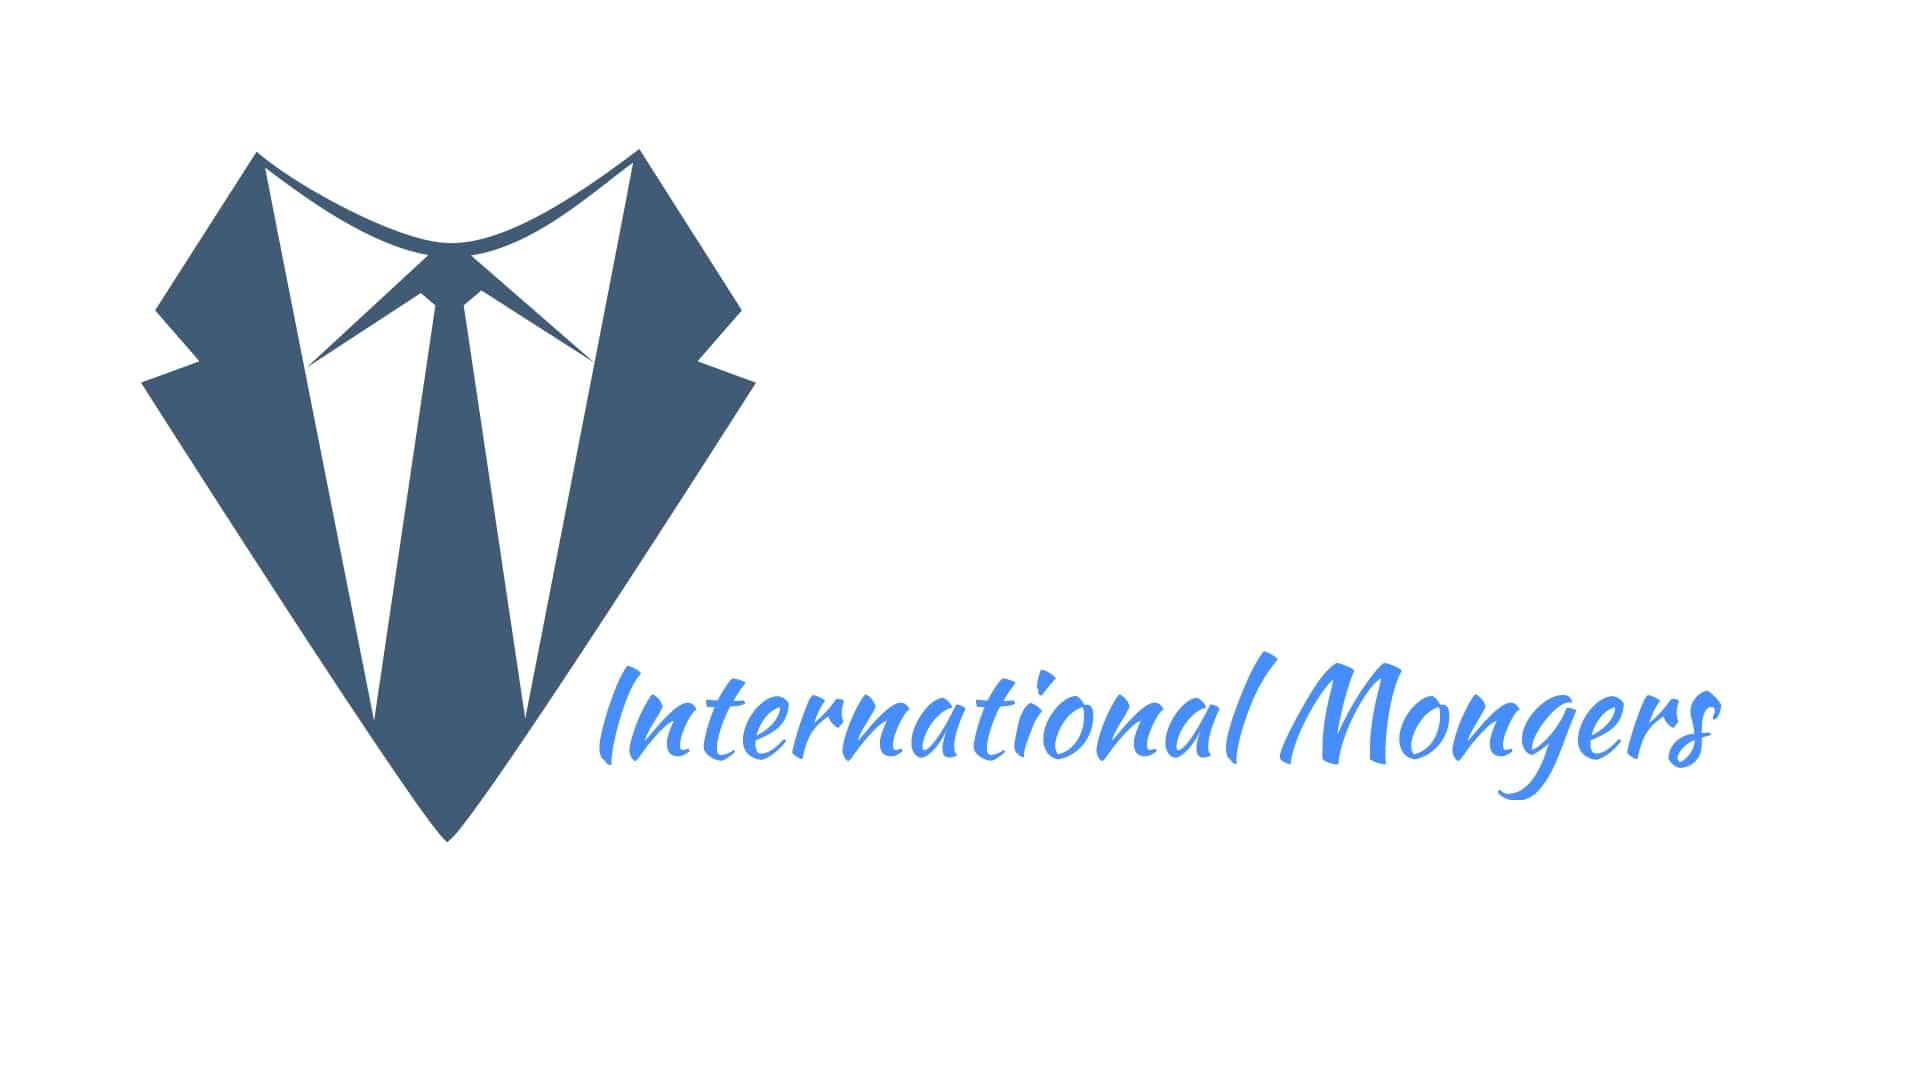 INTERNATIONAL MONGERS